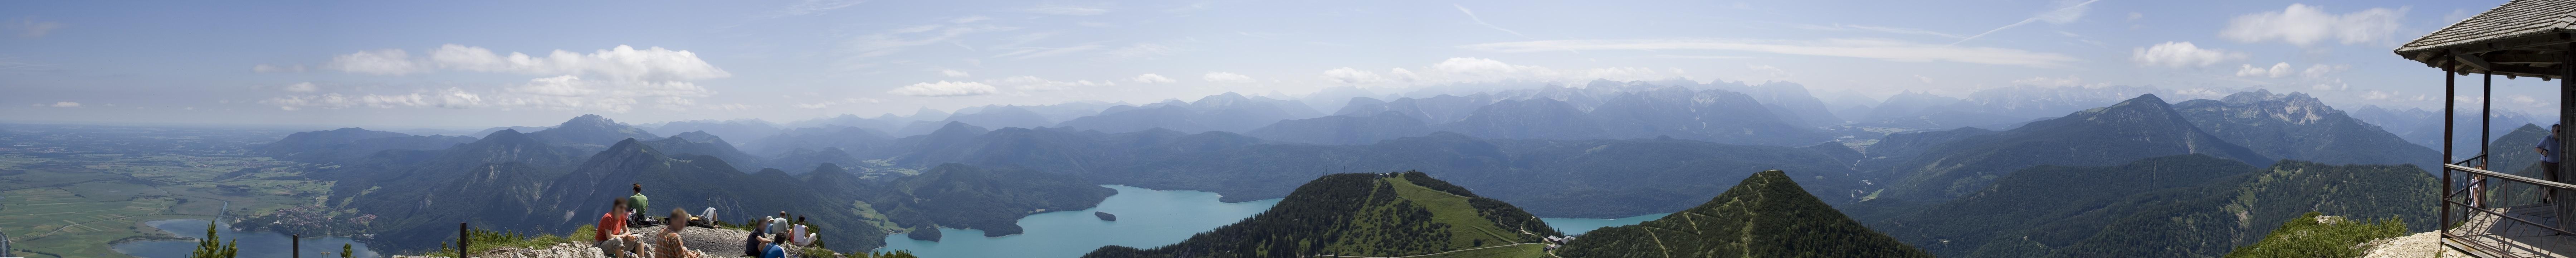 Панорама Альп в Баварии